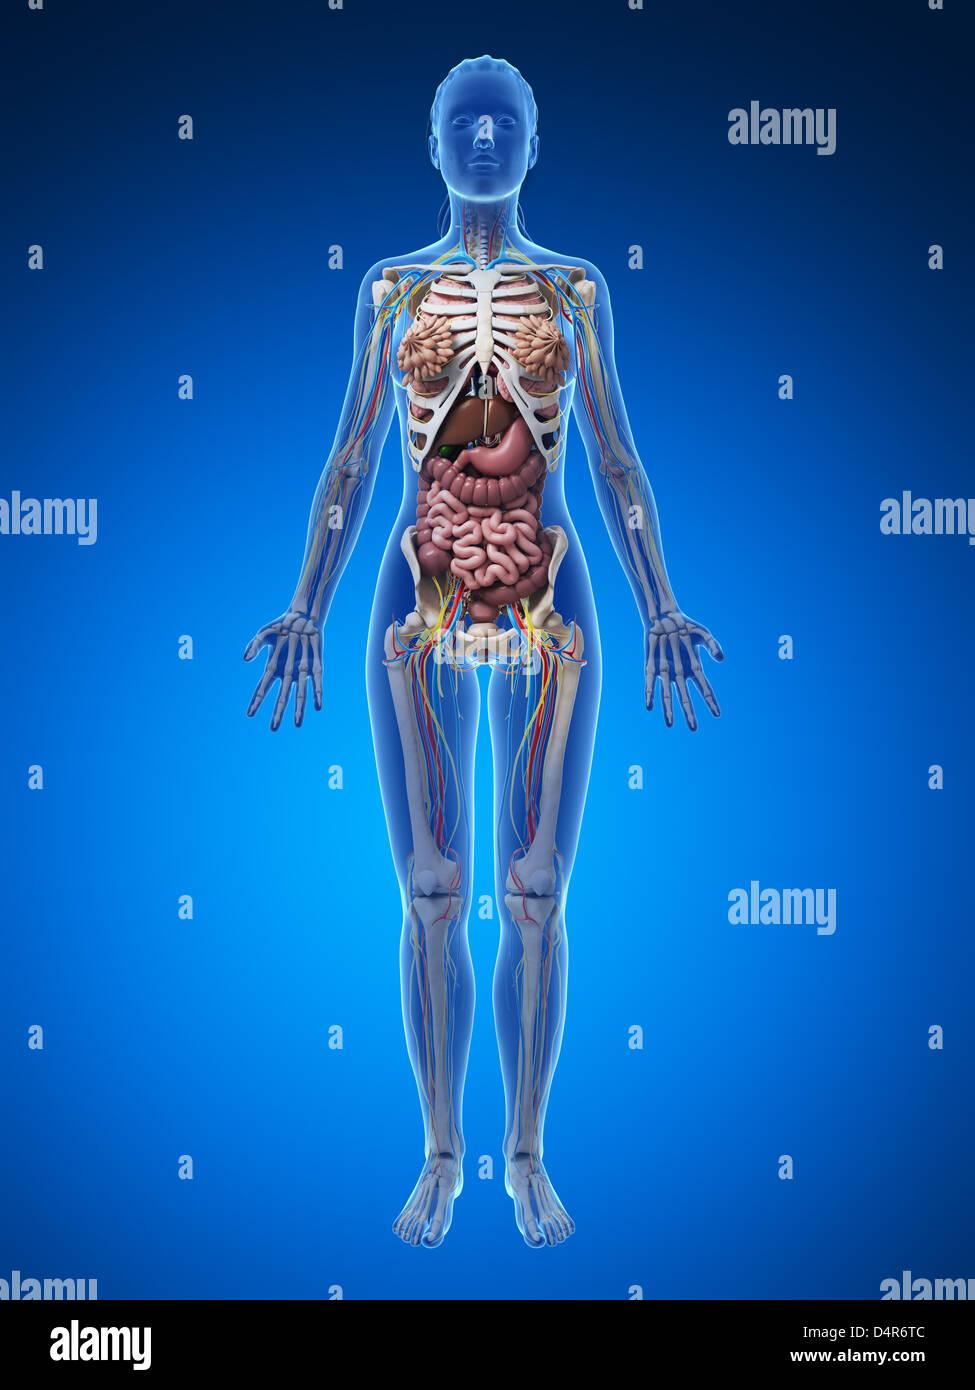 Female Anatomy Diagram High Resolution Stock Photography